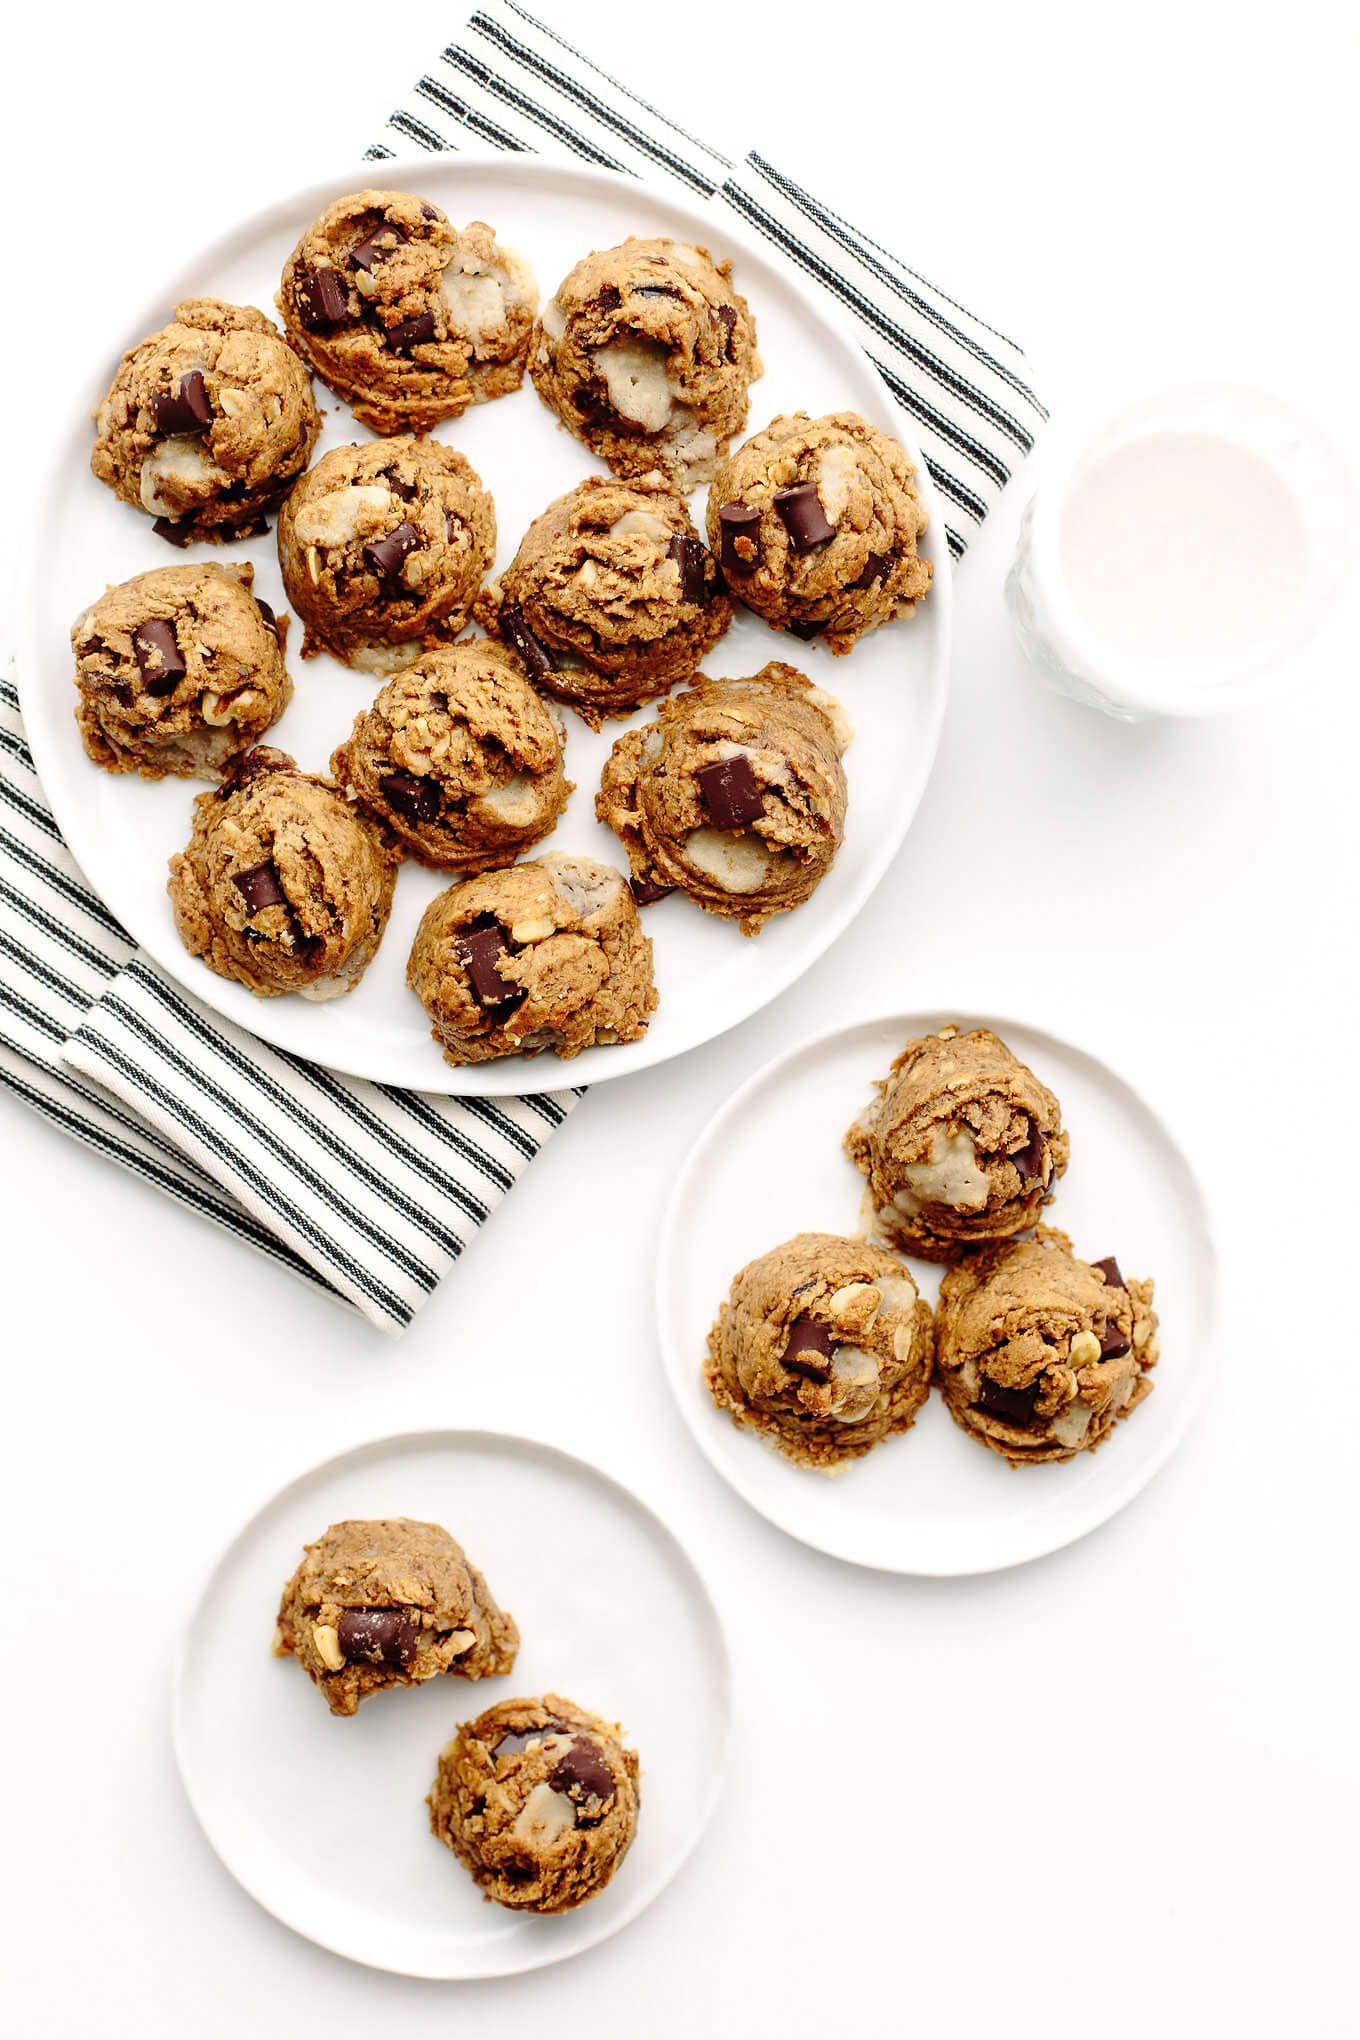 Peanut Butter Kitchen Sink Cookies | Vegan, Gluten-Free | Recipe ...